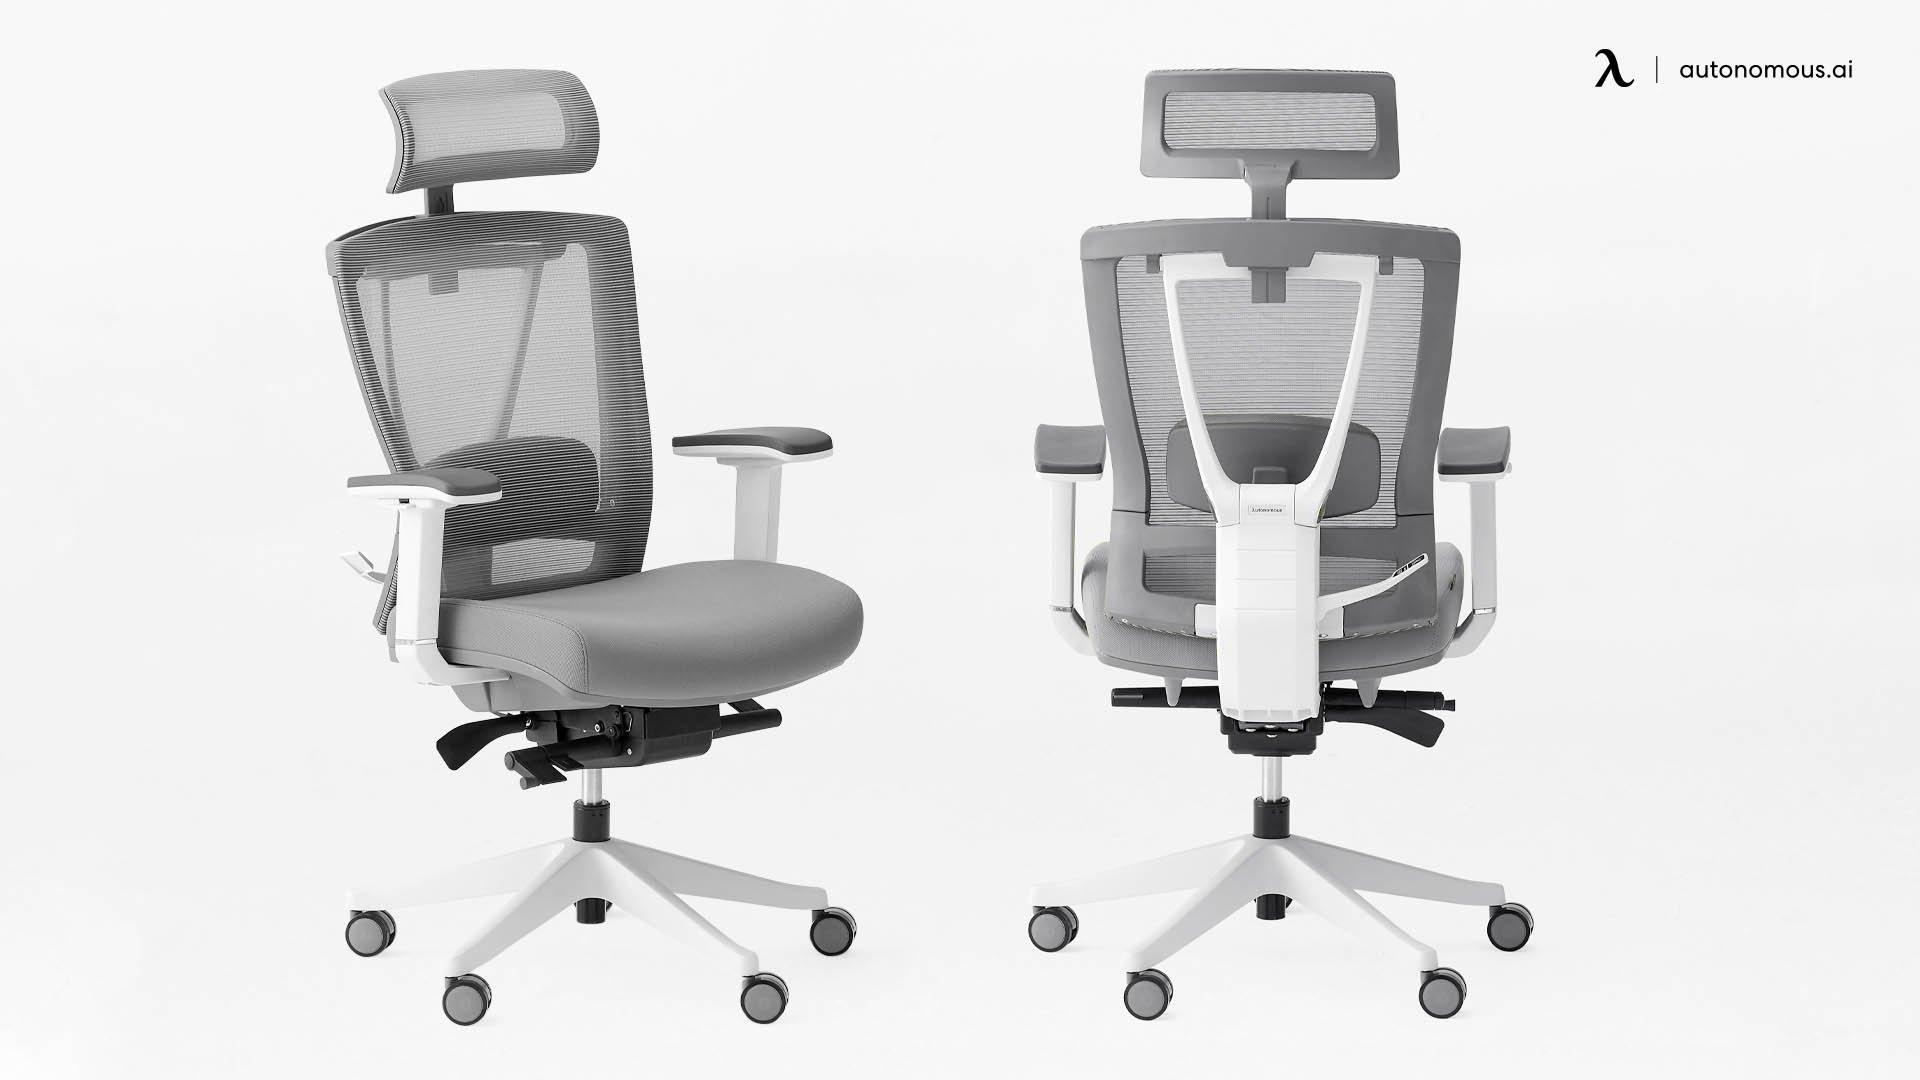 Ergo Chair 2 - Best gaming ergonomic chair